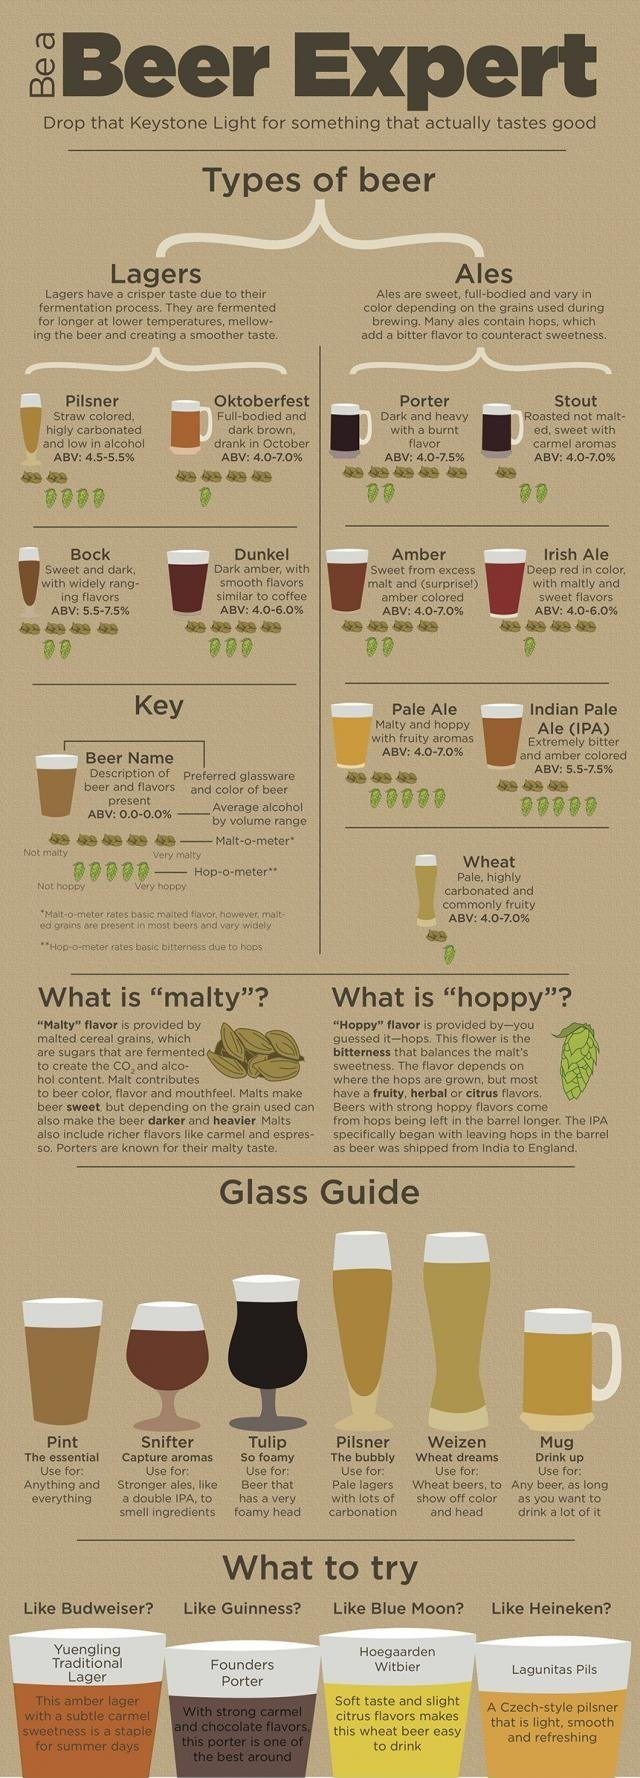 How+to+beer+for+beginners+beer+is+god+beer+is_767317_5702726